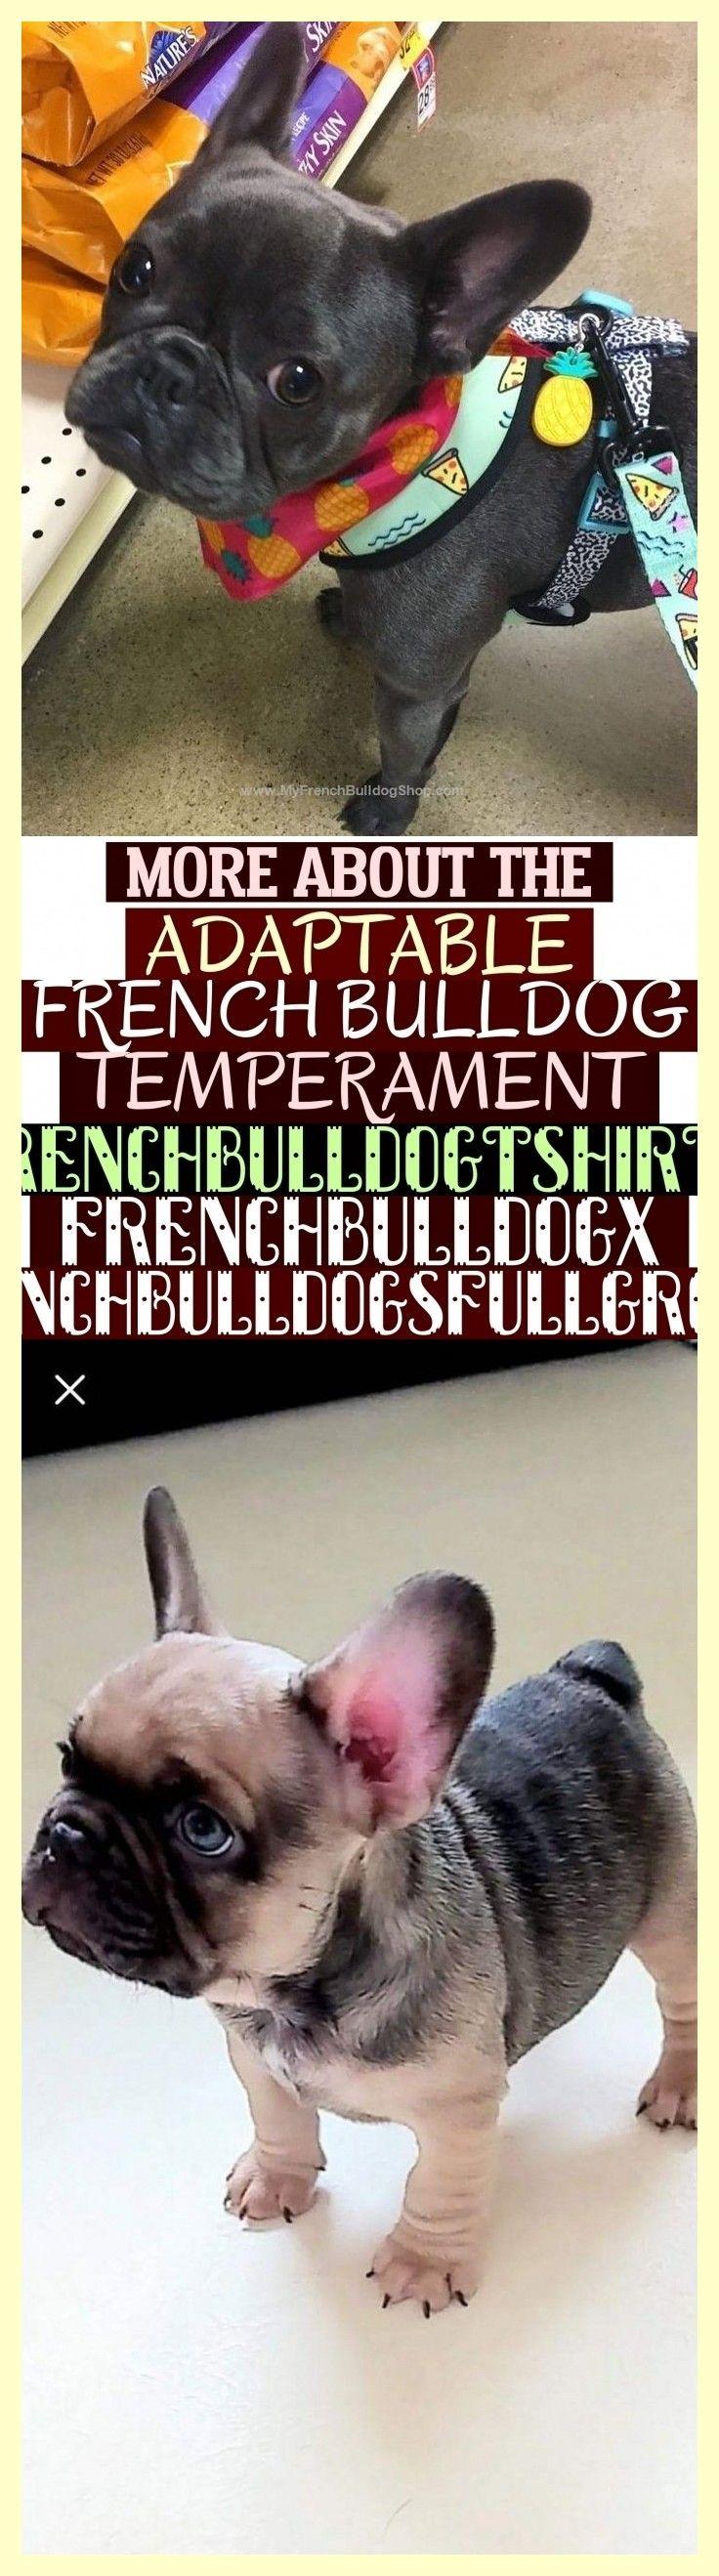 More About The Adaptable French Bulldog Temperament Frenchbulldogtshirts Frenchbulldogx Frenchbulldogsfullgrown Weitere Informationen Zum Anpassungsfahigen Temp French Bulldog Bulldog Cute Animals